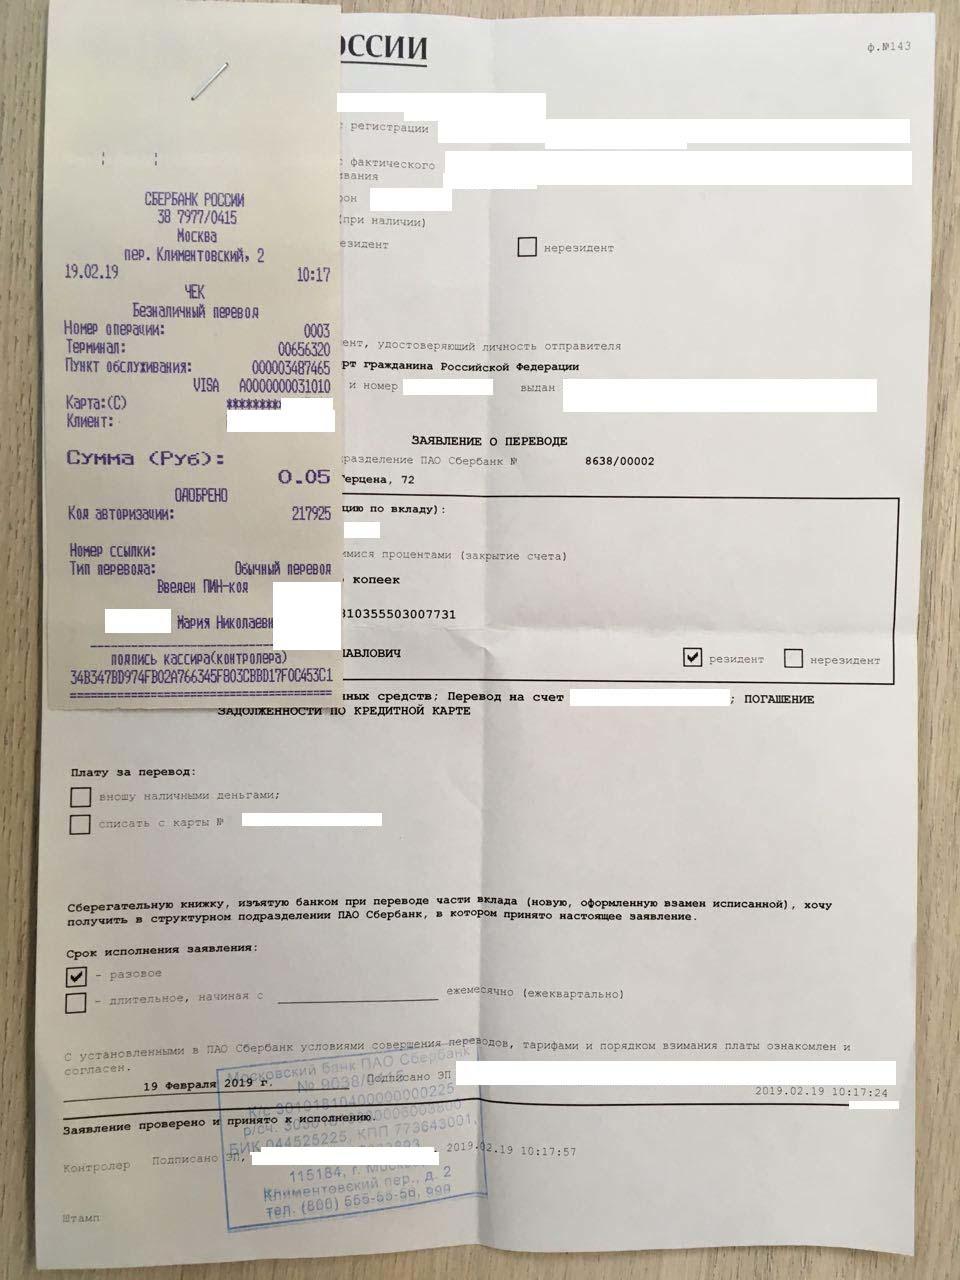 газпромбанк оплатить кредит онлайн